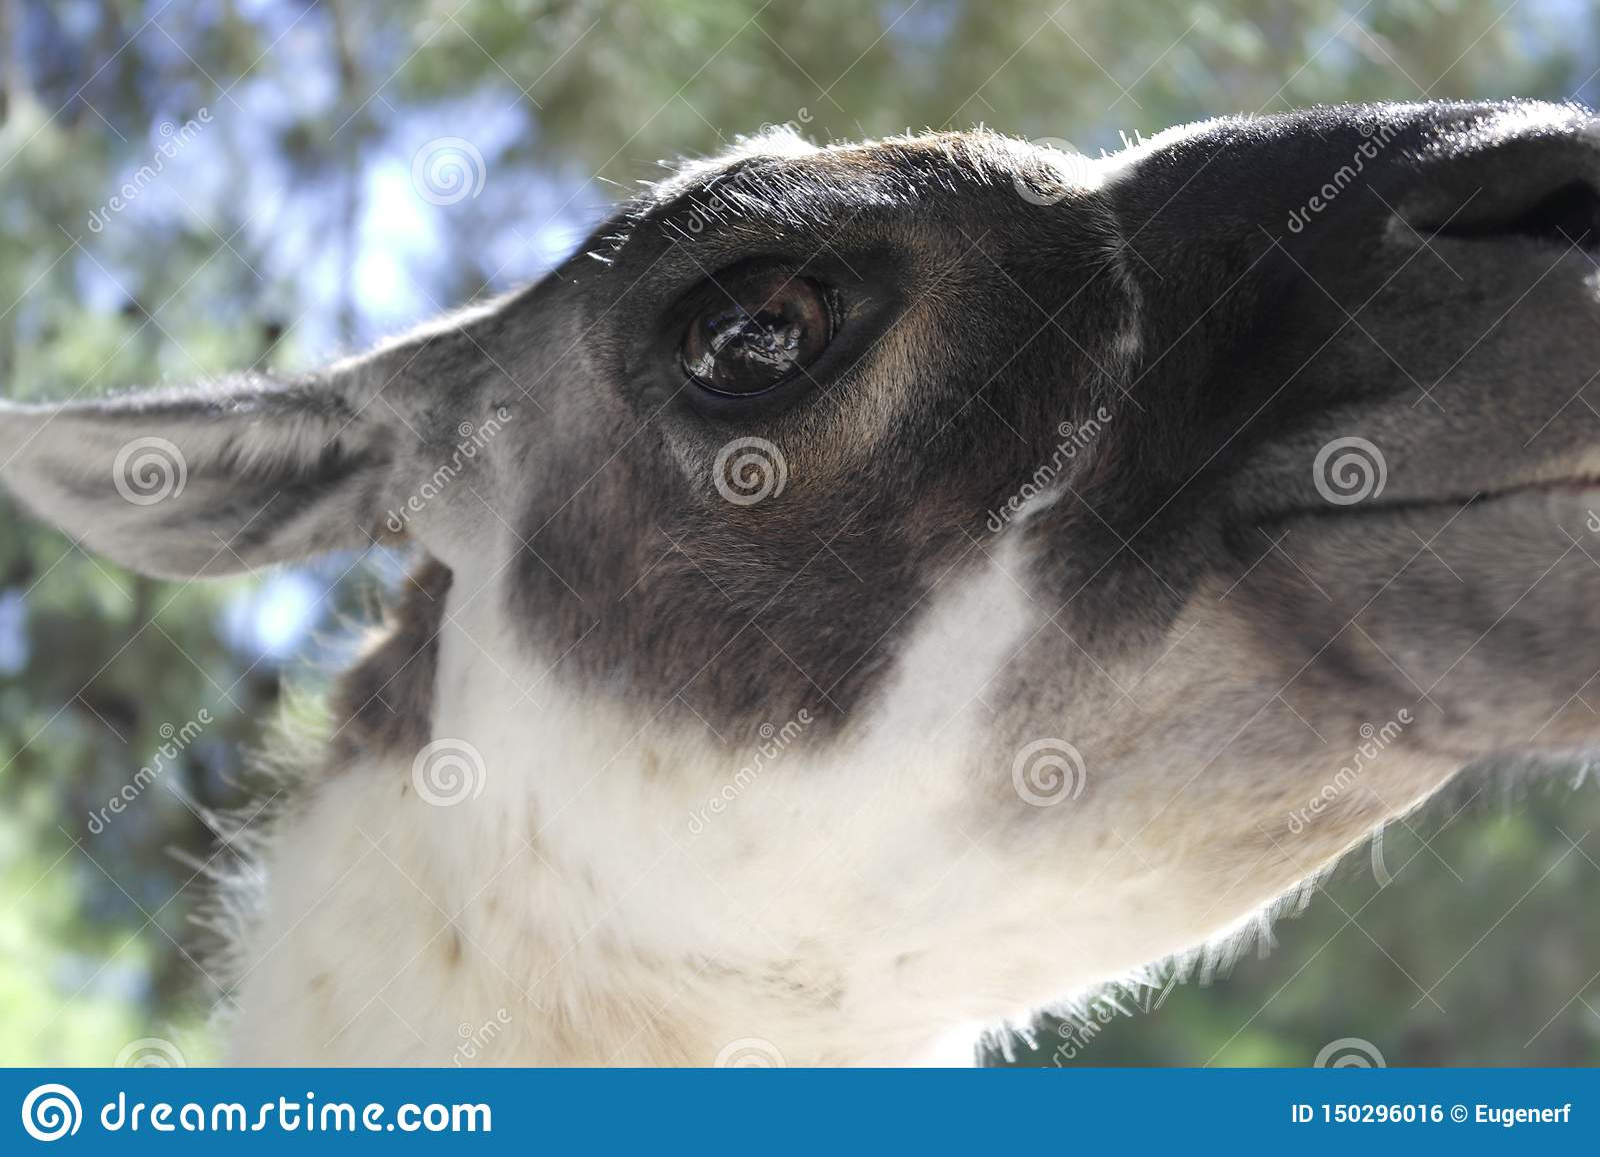 Der Anblick des Alpakas